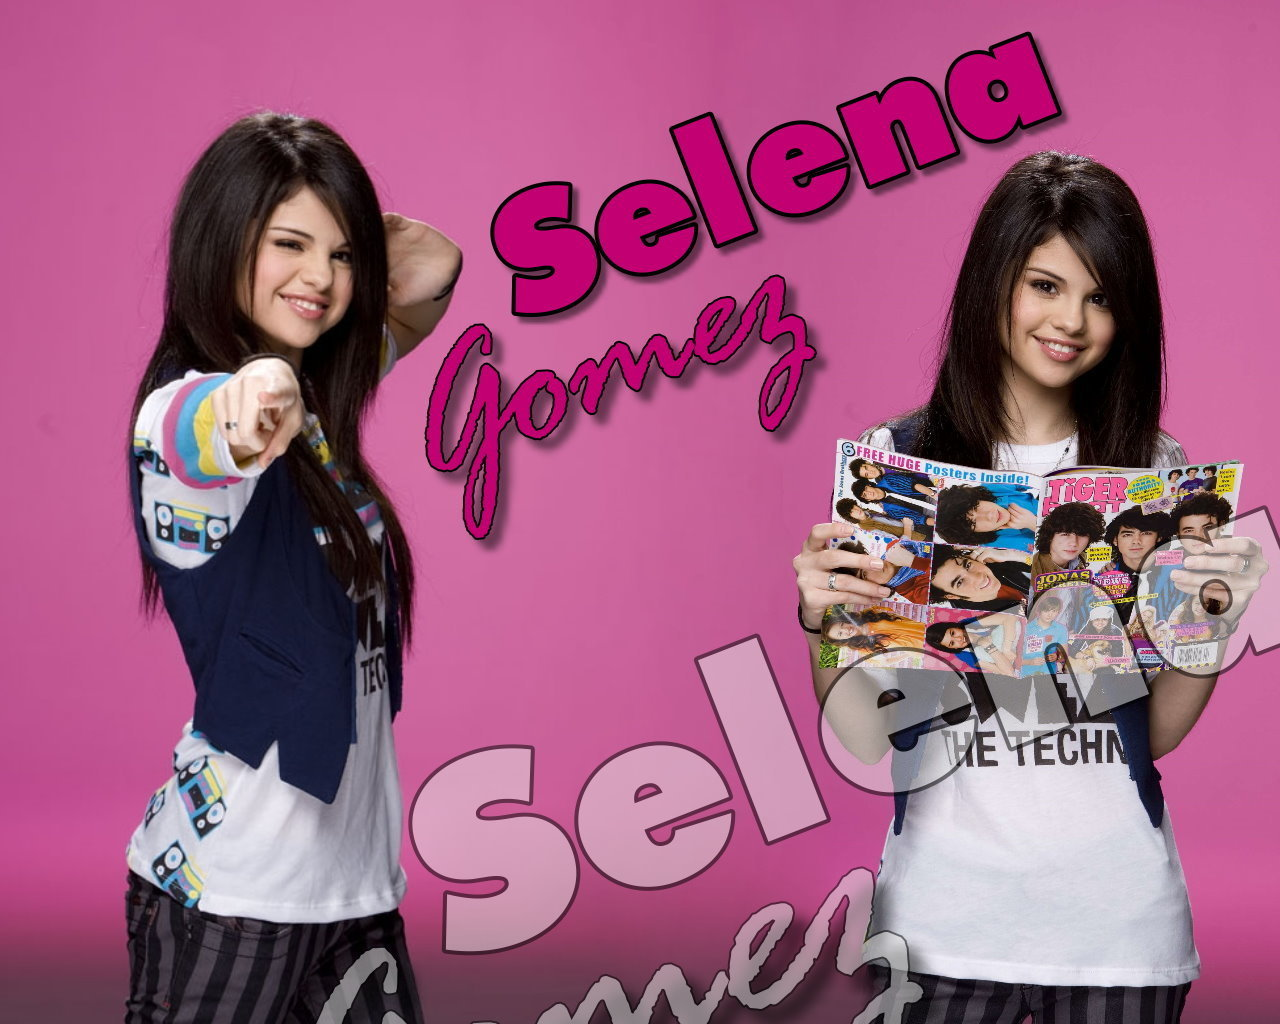 http://3.bp.blogspot.com/-OVDSty74BBY/Tmhcz5EabYI/AAAAAAAAAtw/Q27h7wYa1lc/s1600/Selena-Gomez-Wallpaper-selena-gomez-6849164-1280-1024.jpg